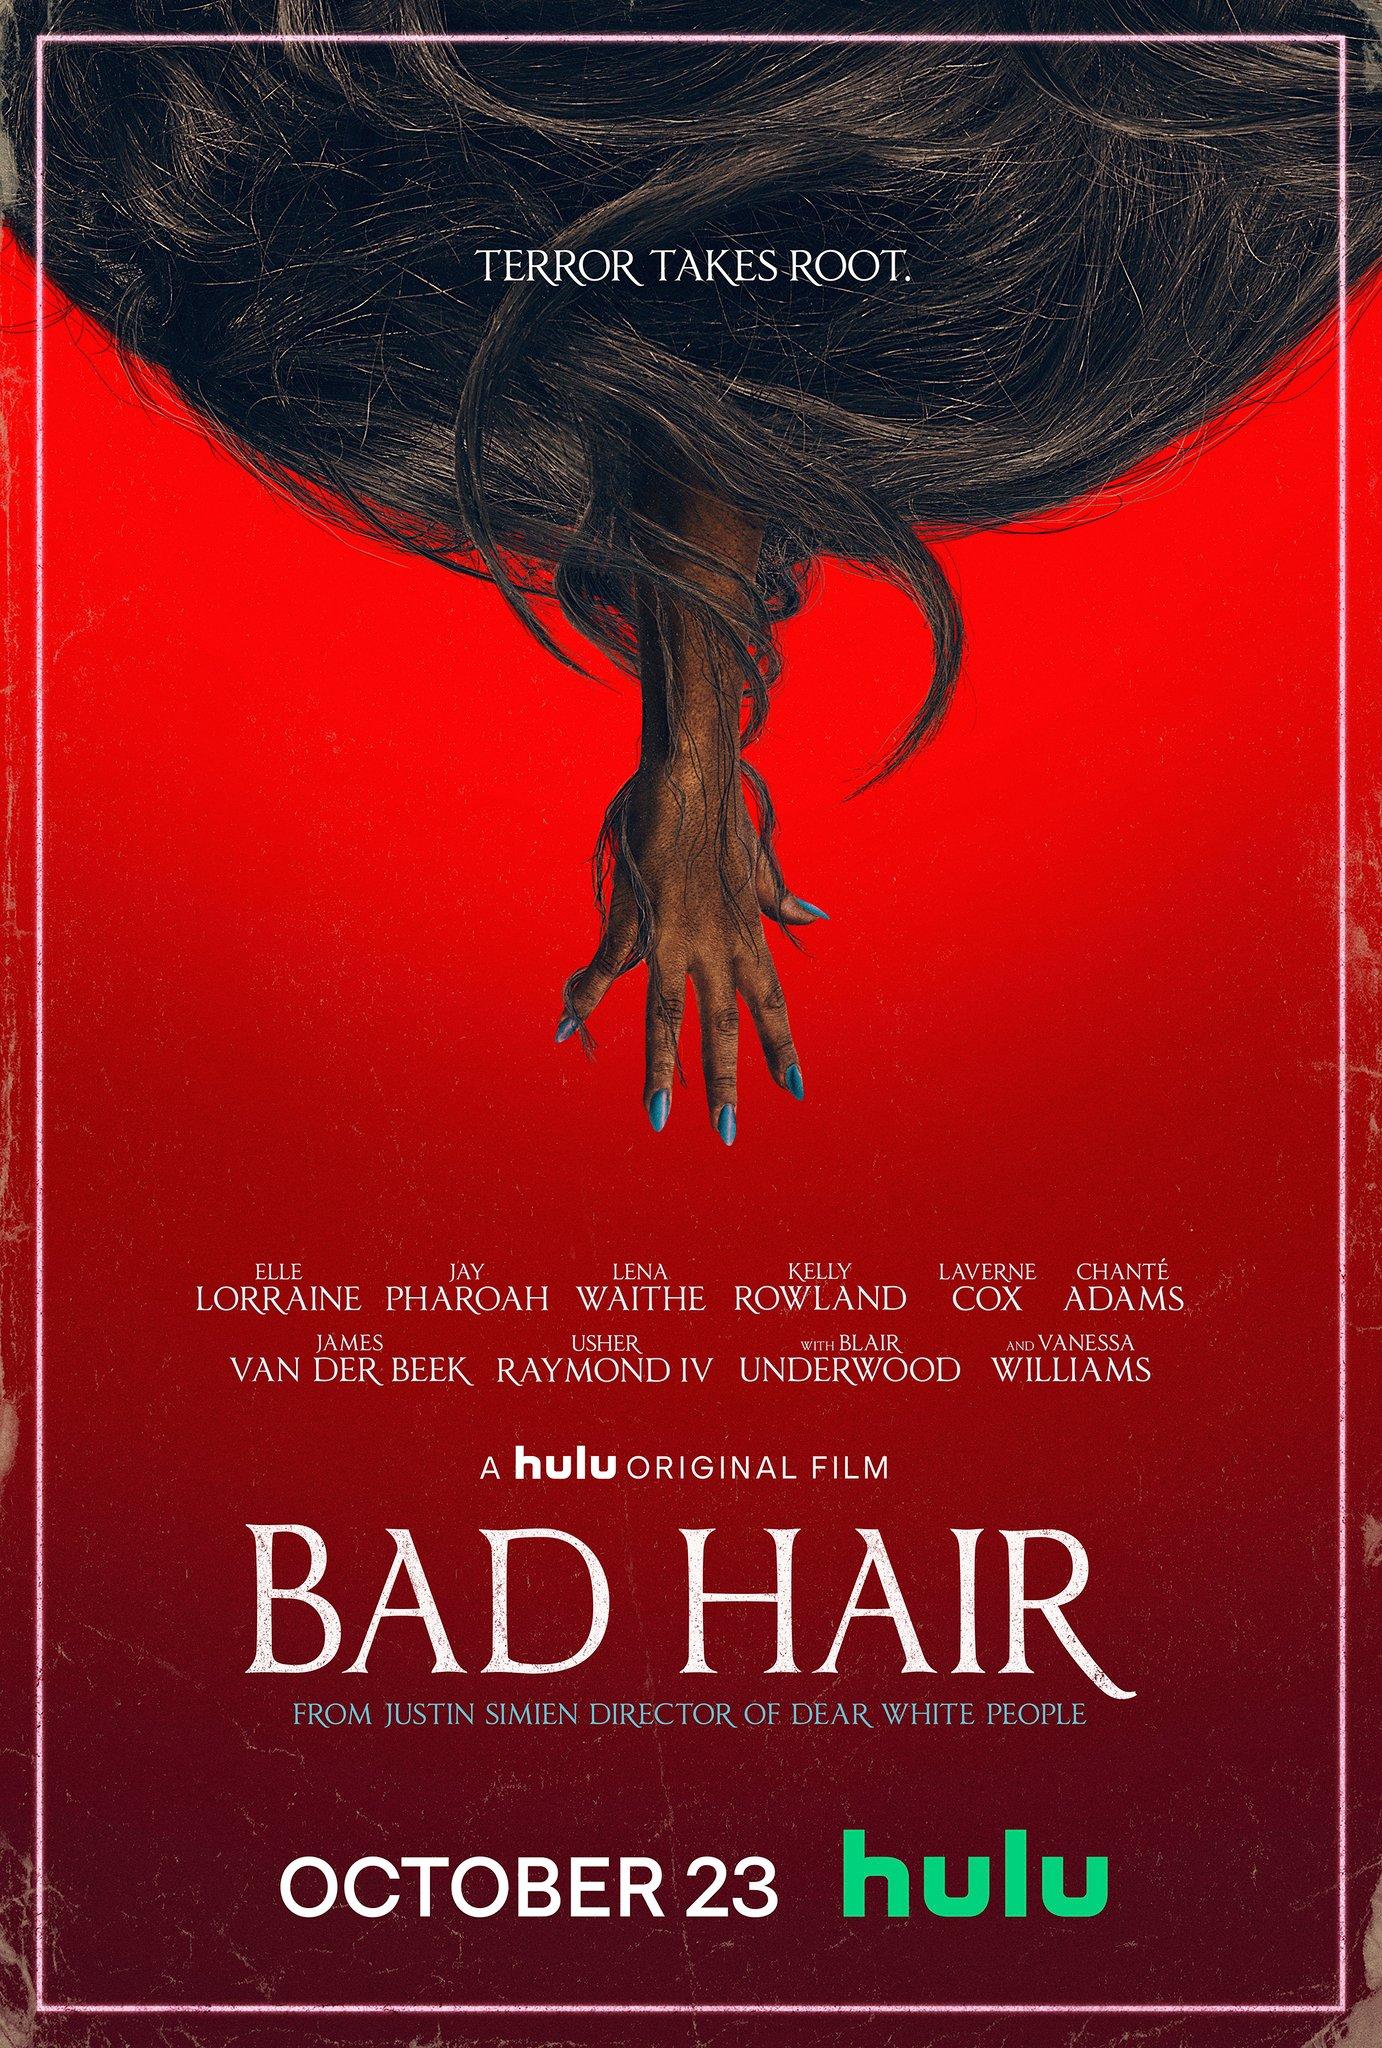 Bad Hair Trailer & Poster